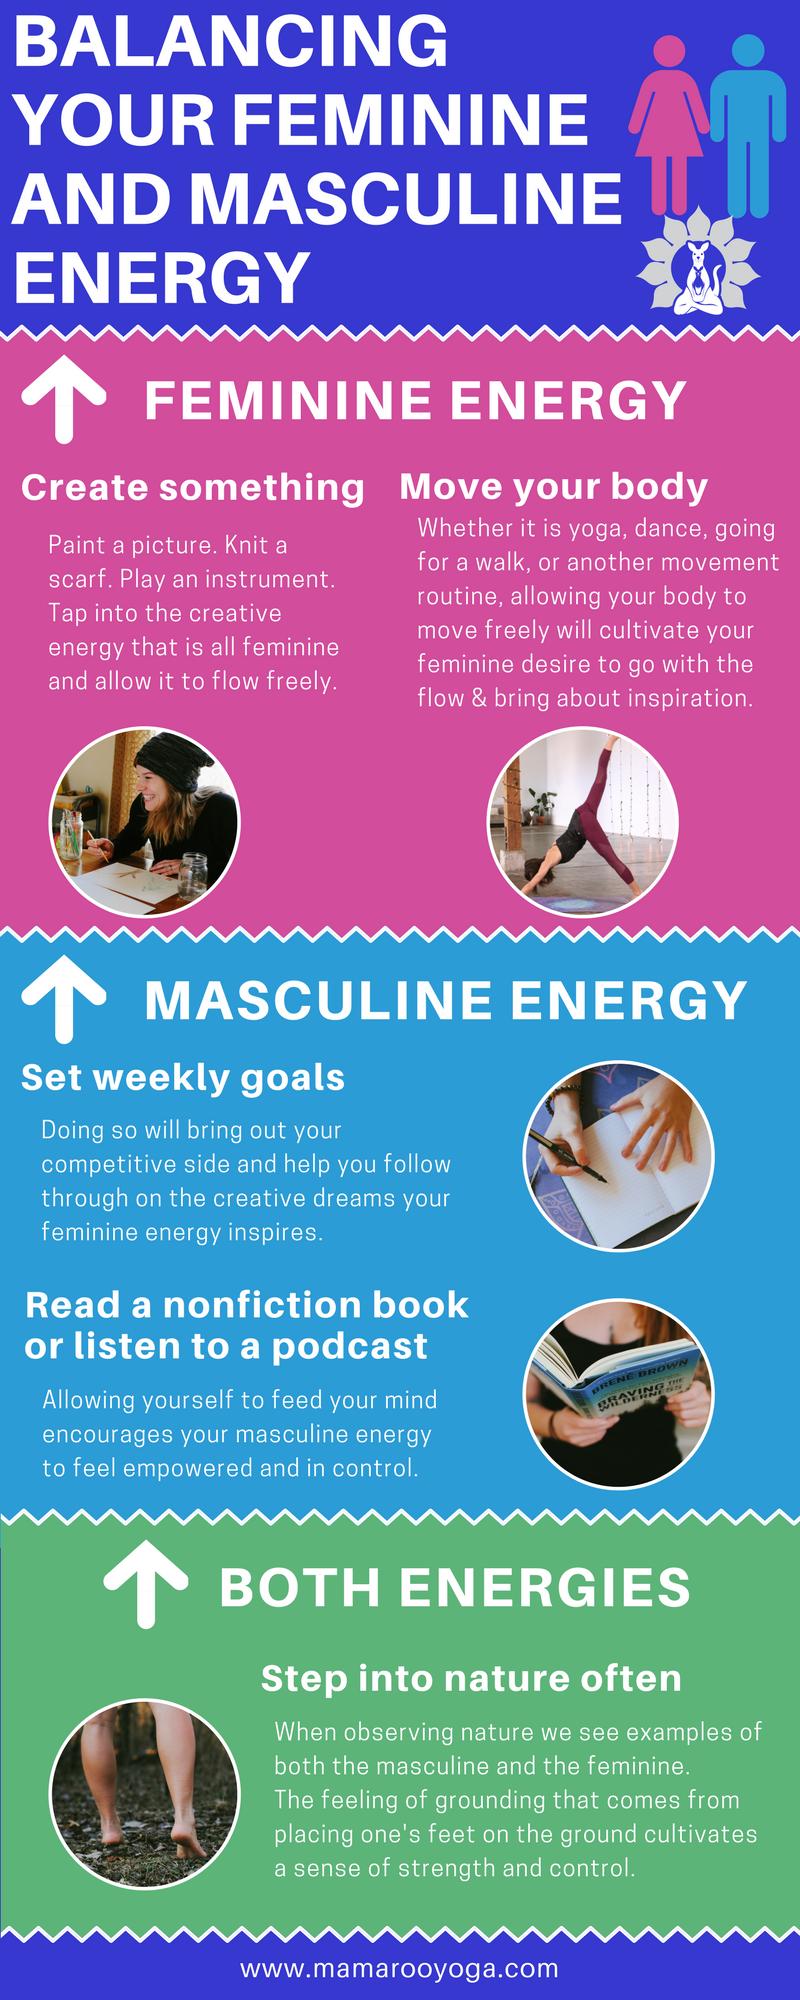 how to have feminine energy